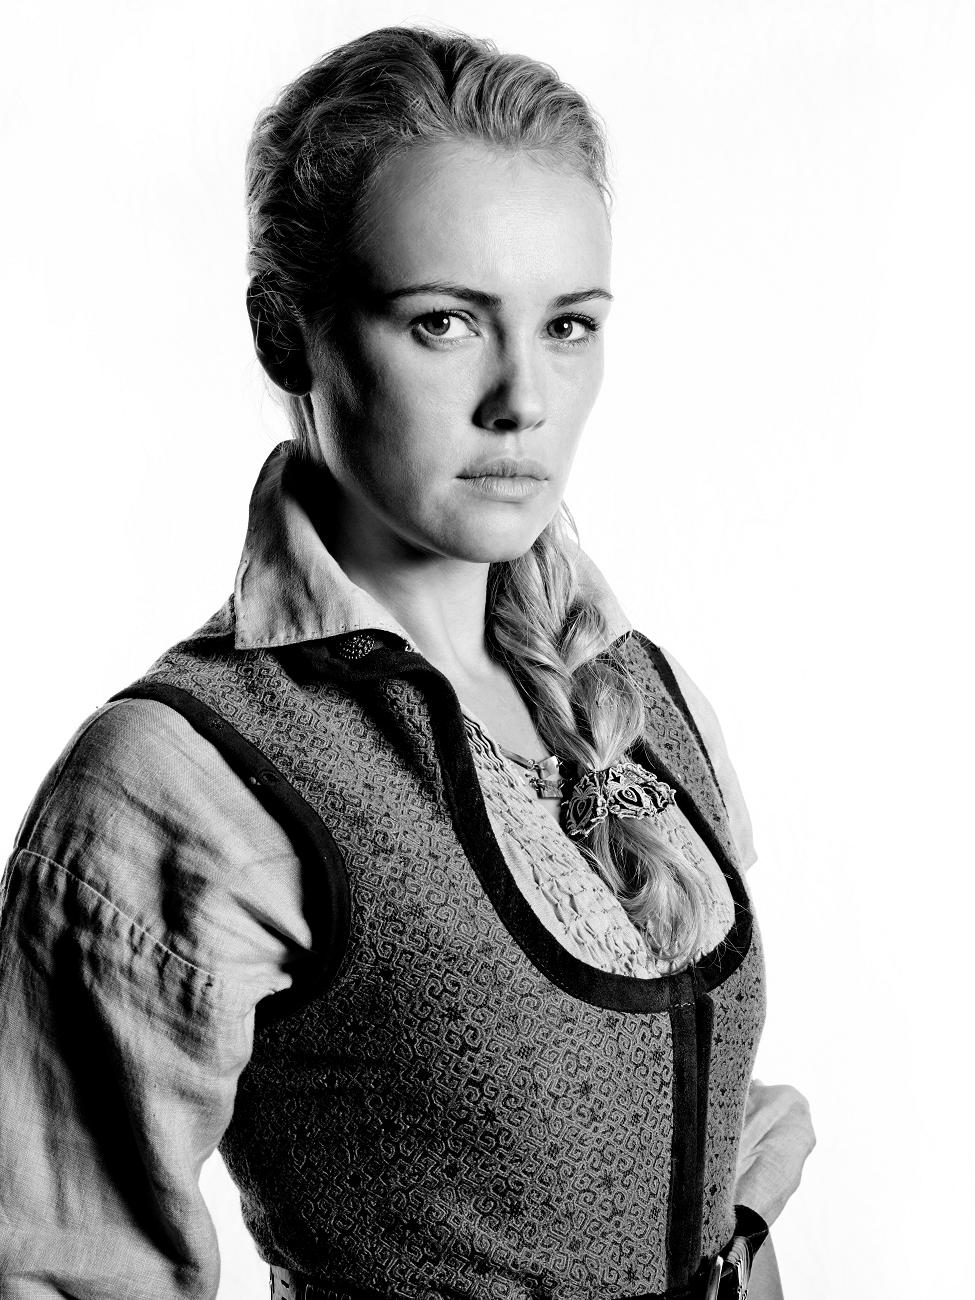 Eleanor Guthrie - Black Sails photo (38904919) - fanpop